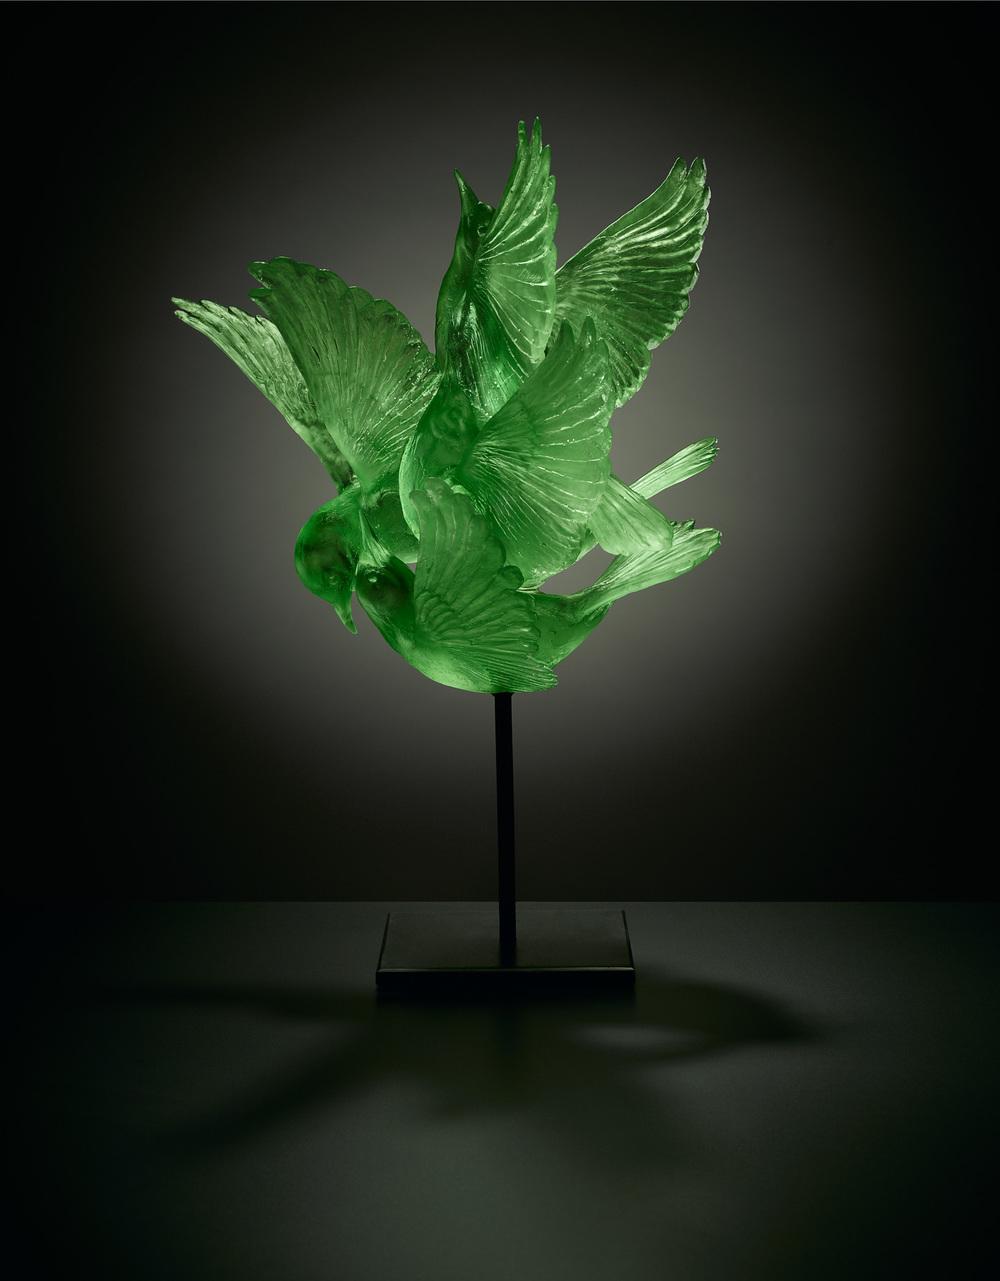 Green, Katherine Rutecki, 2011